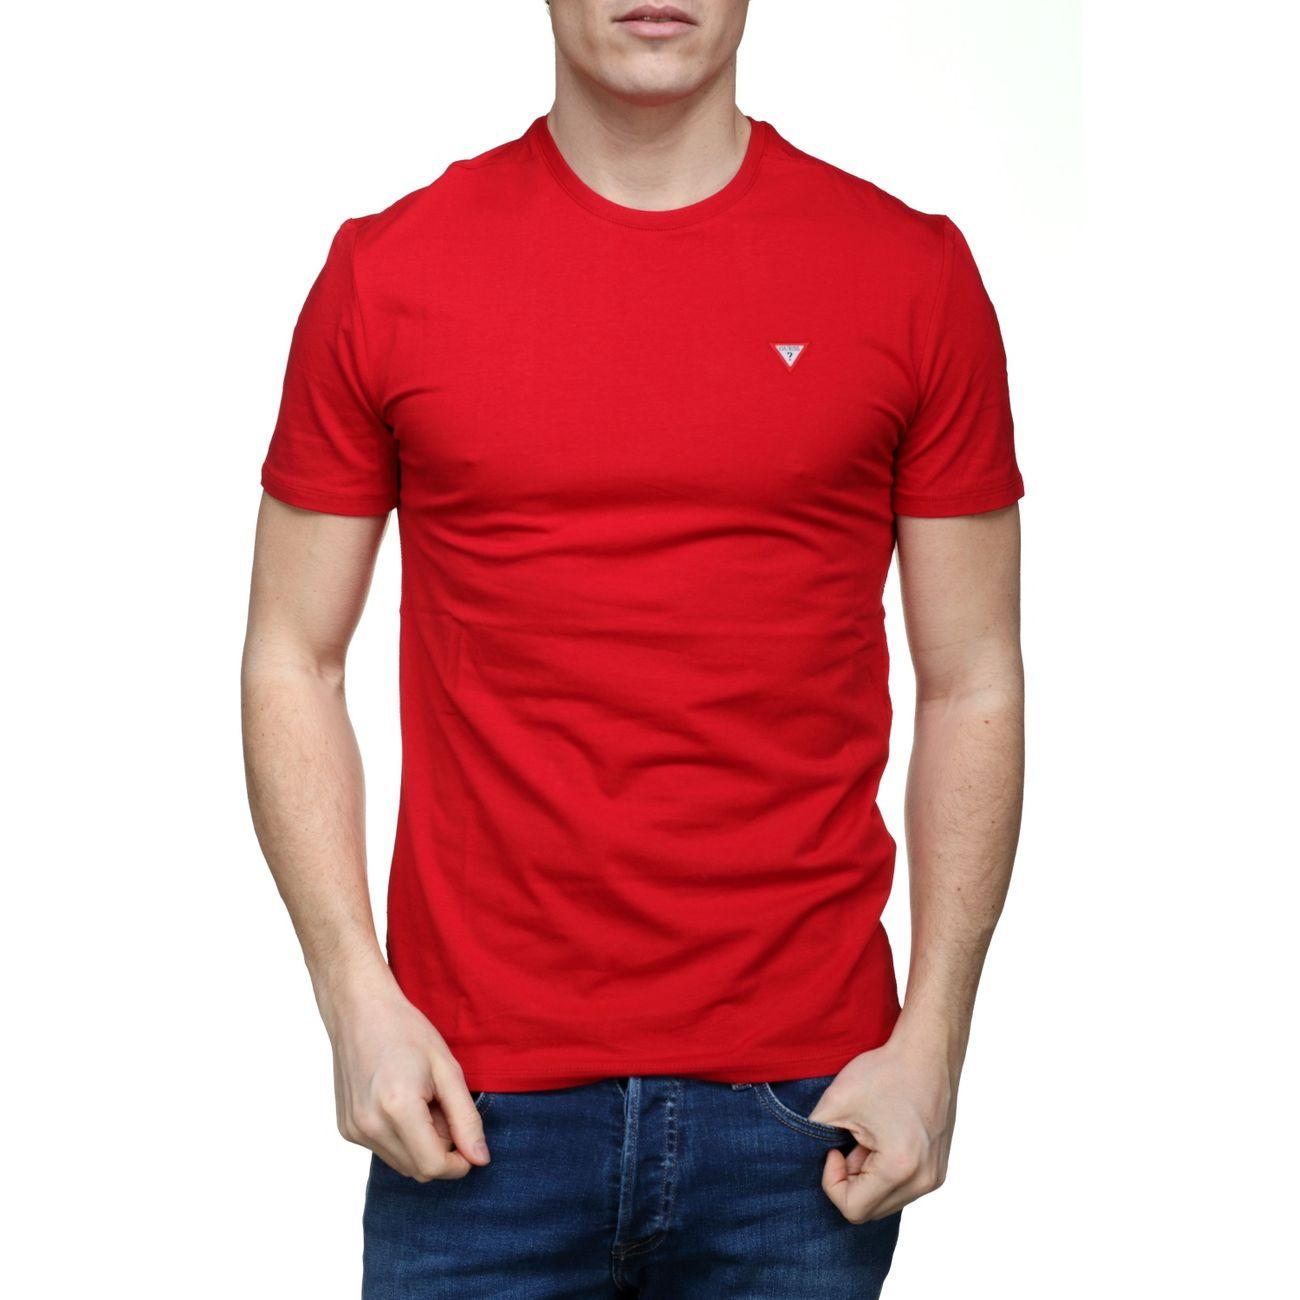 check out closer at wholesale dealer Tee Shirt Guess M82i32 - J1300 C512 Rouge – achat et prix ...